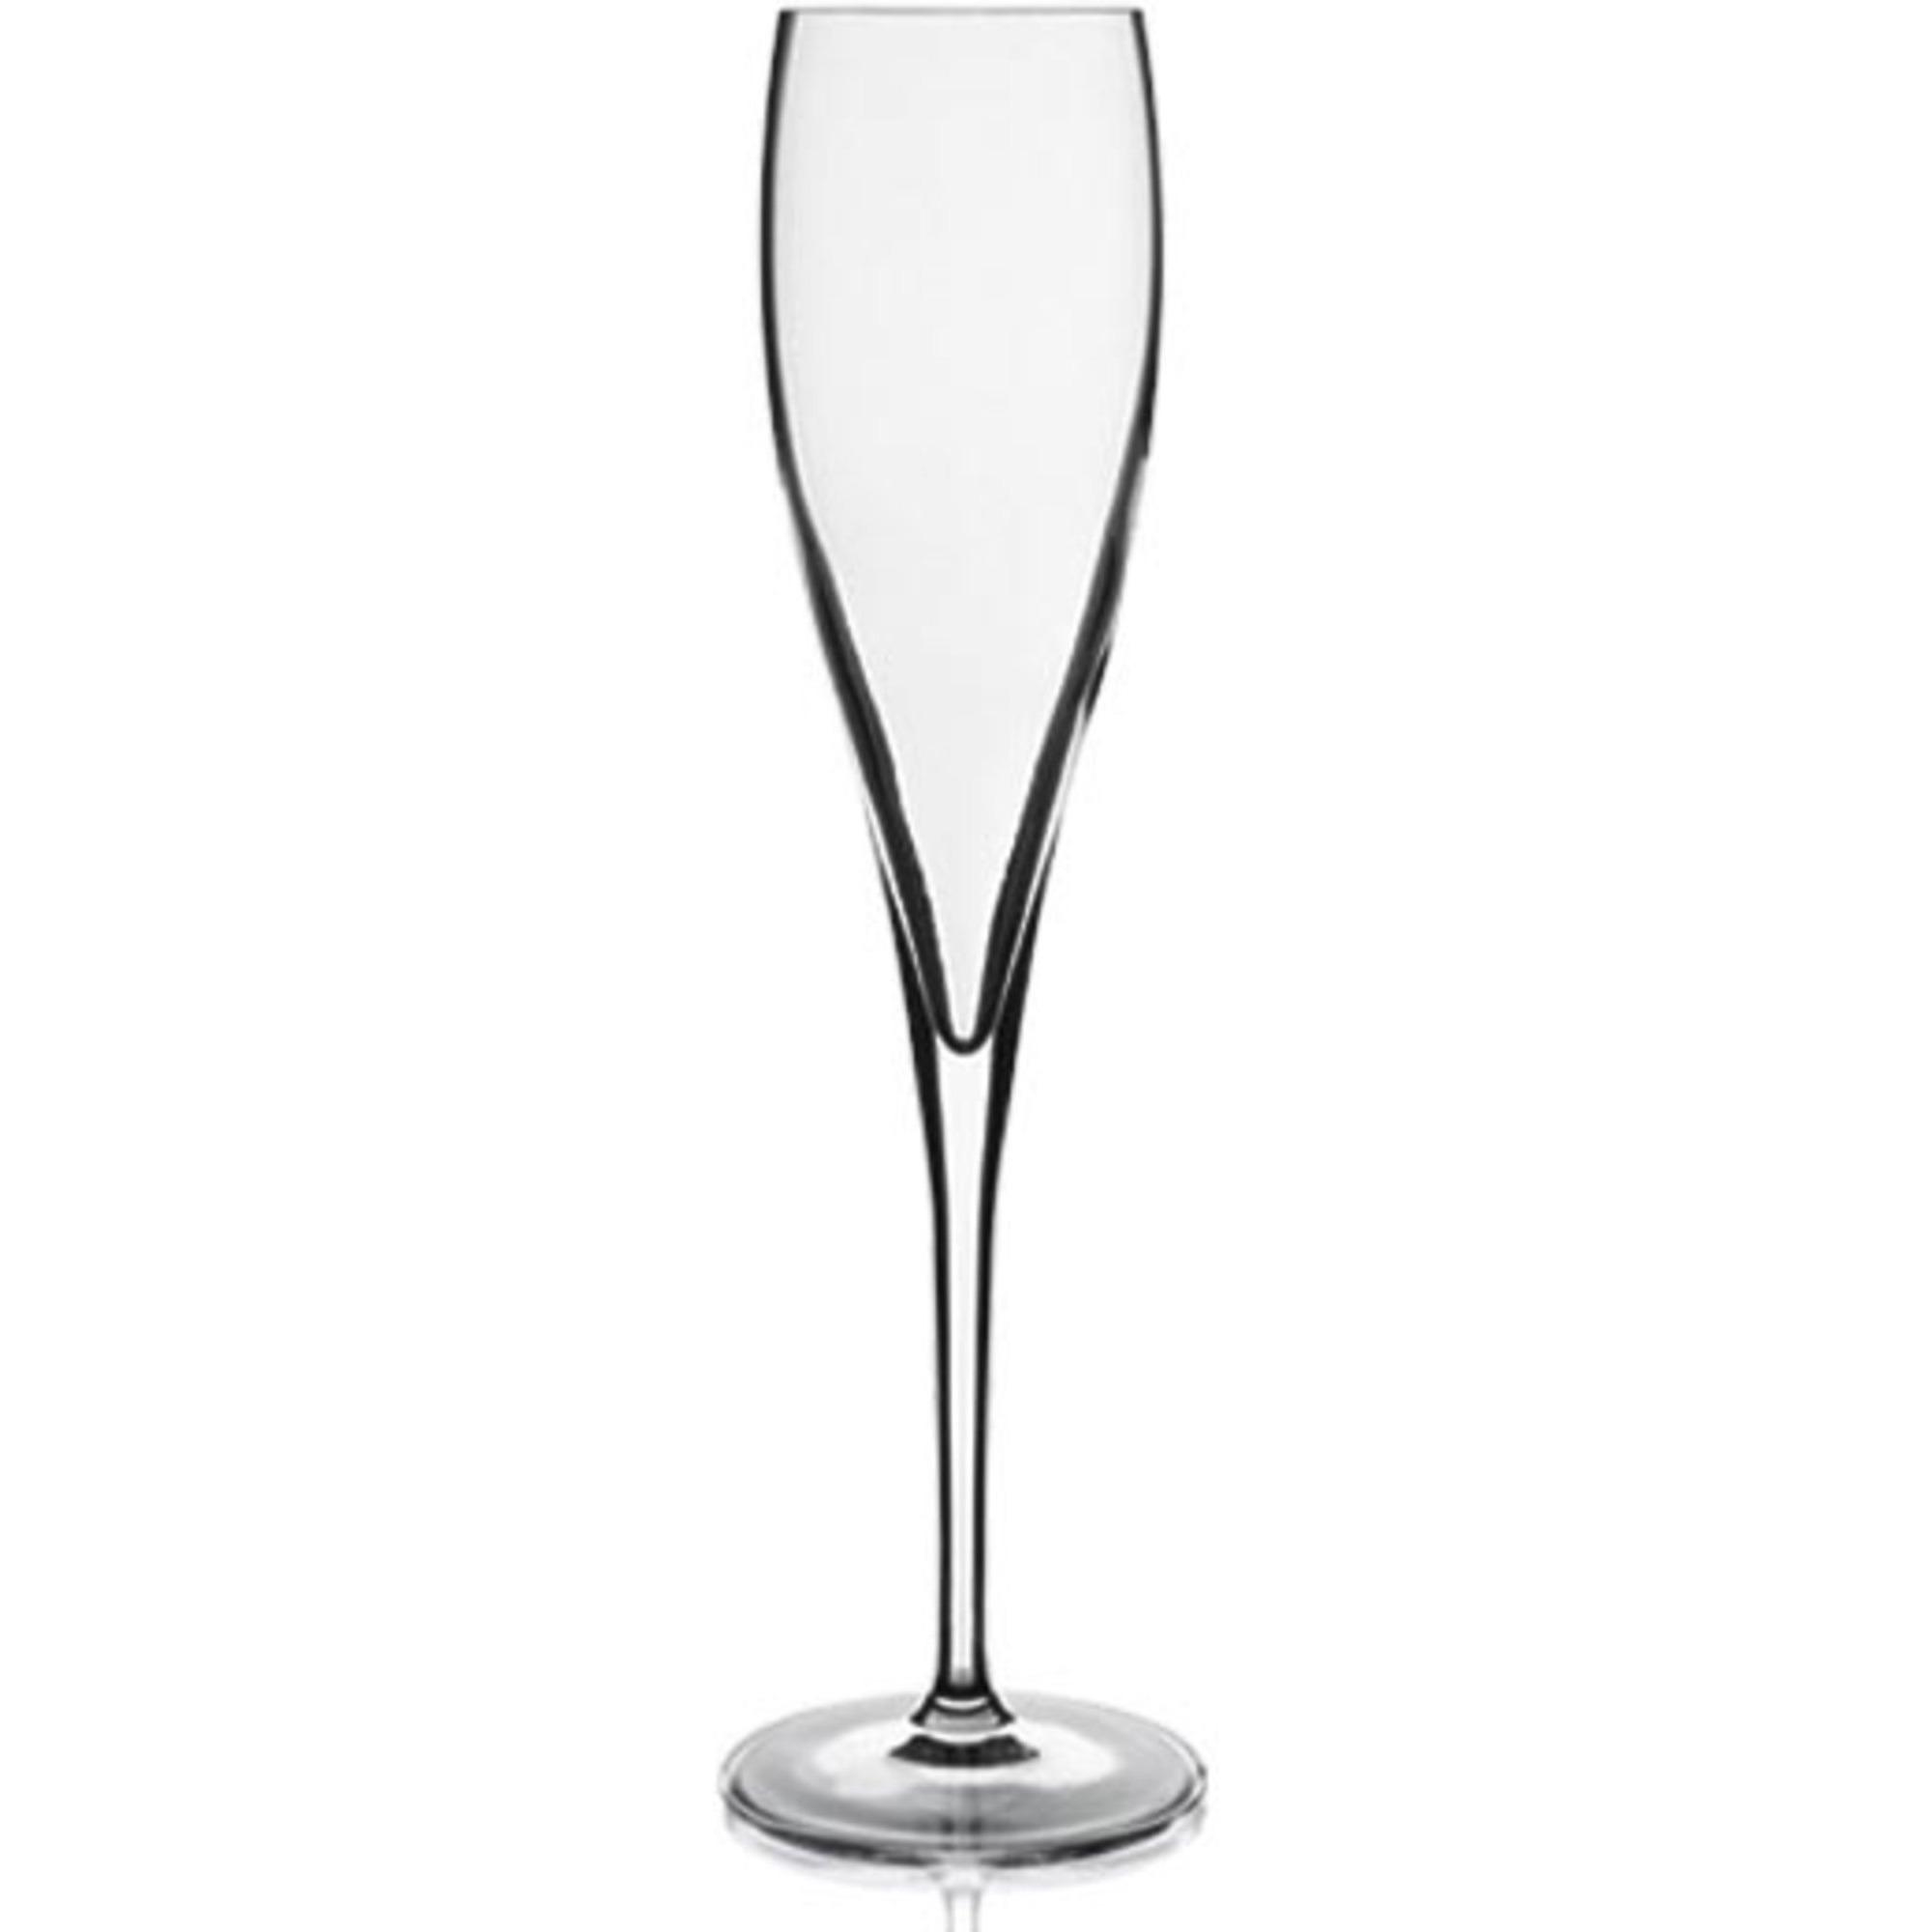 Luigi Bormioli Accademia Vinoteque 2 stk. Champagneglas